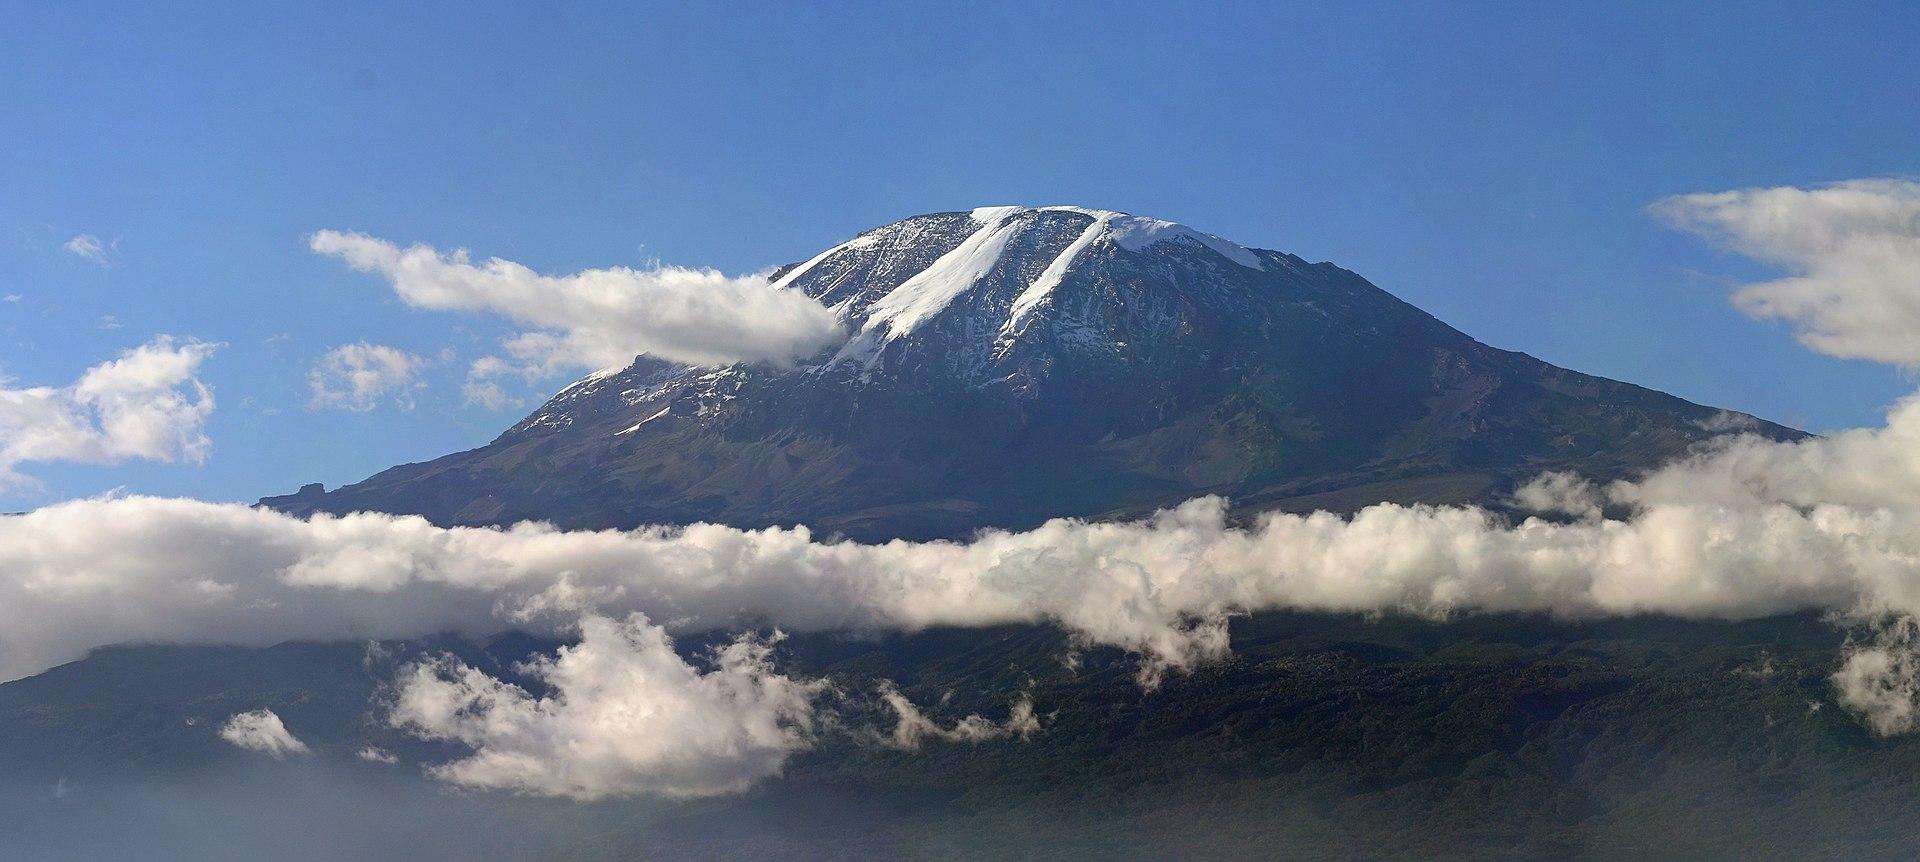 1920px Mount Kilimanjaro